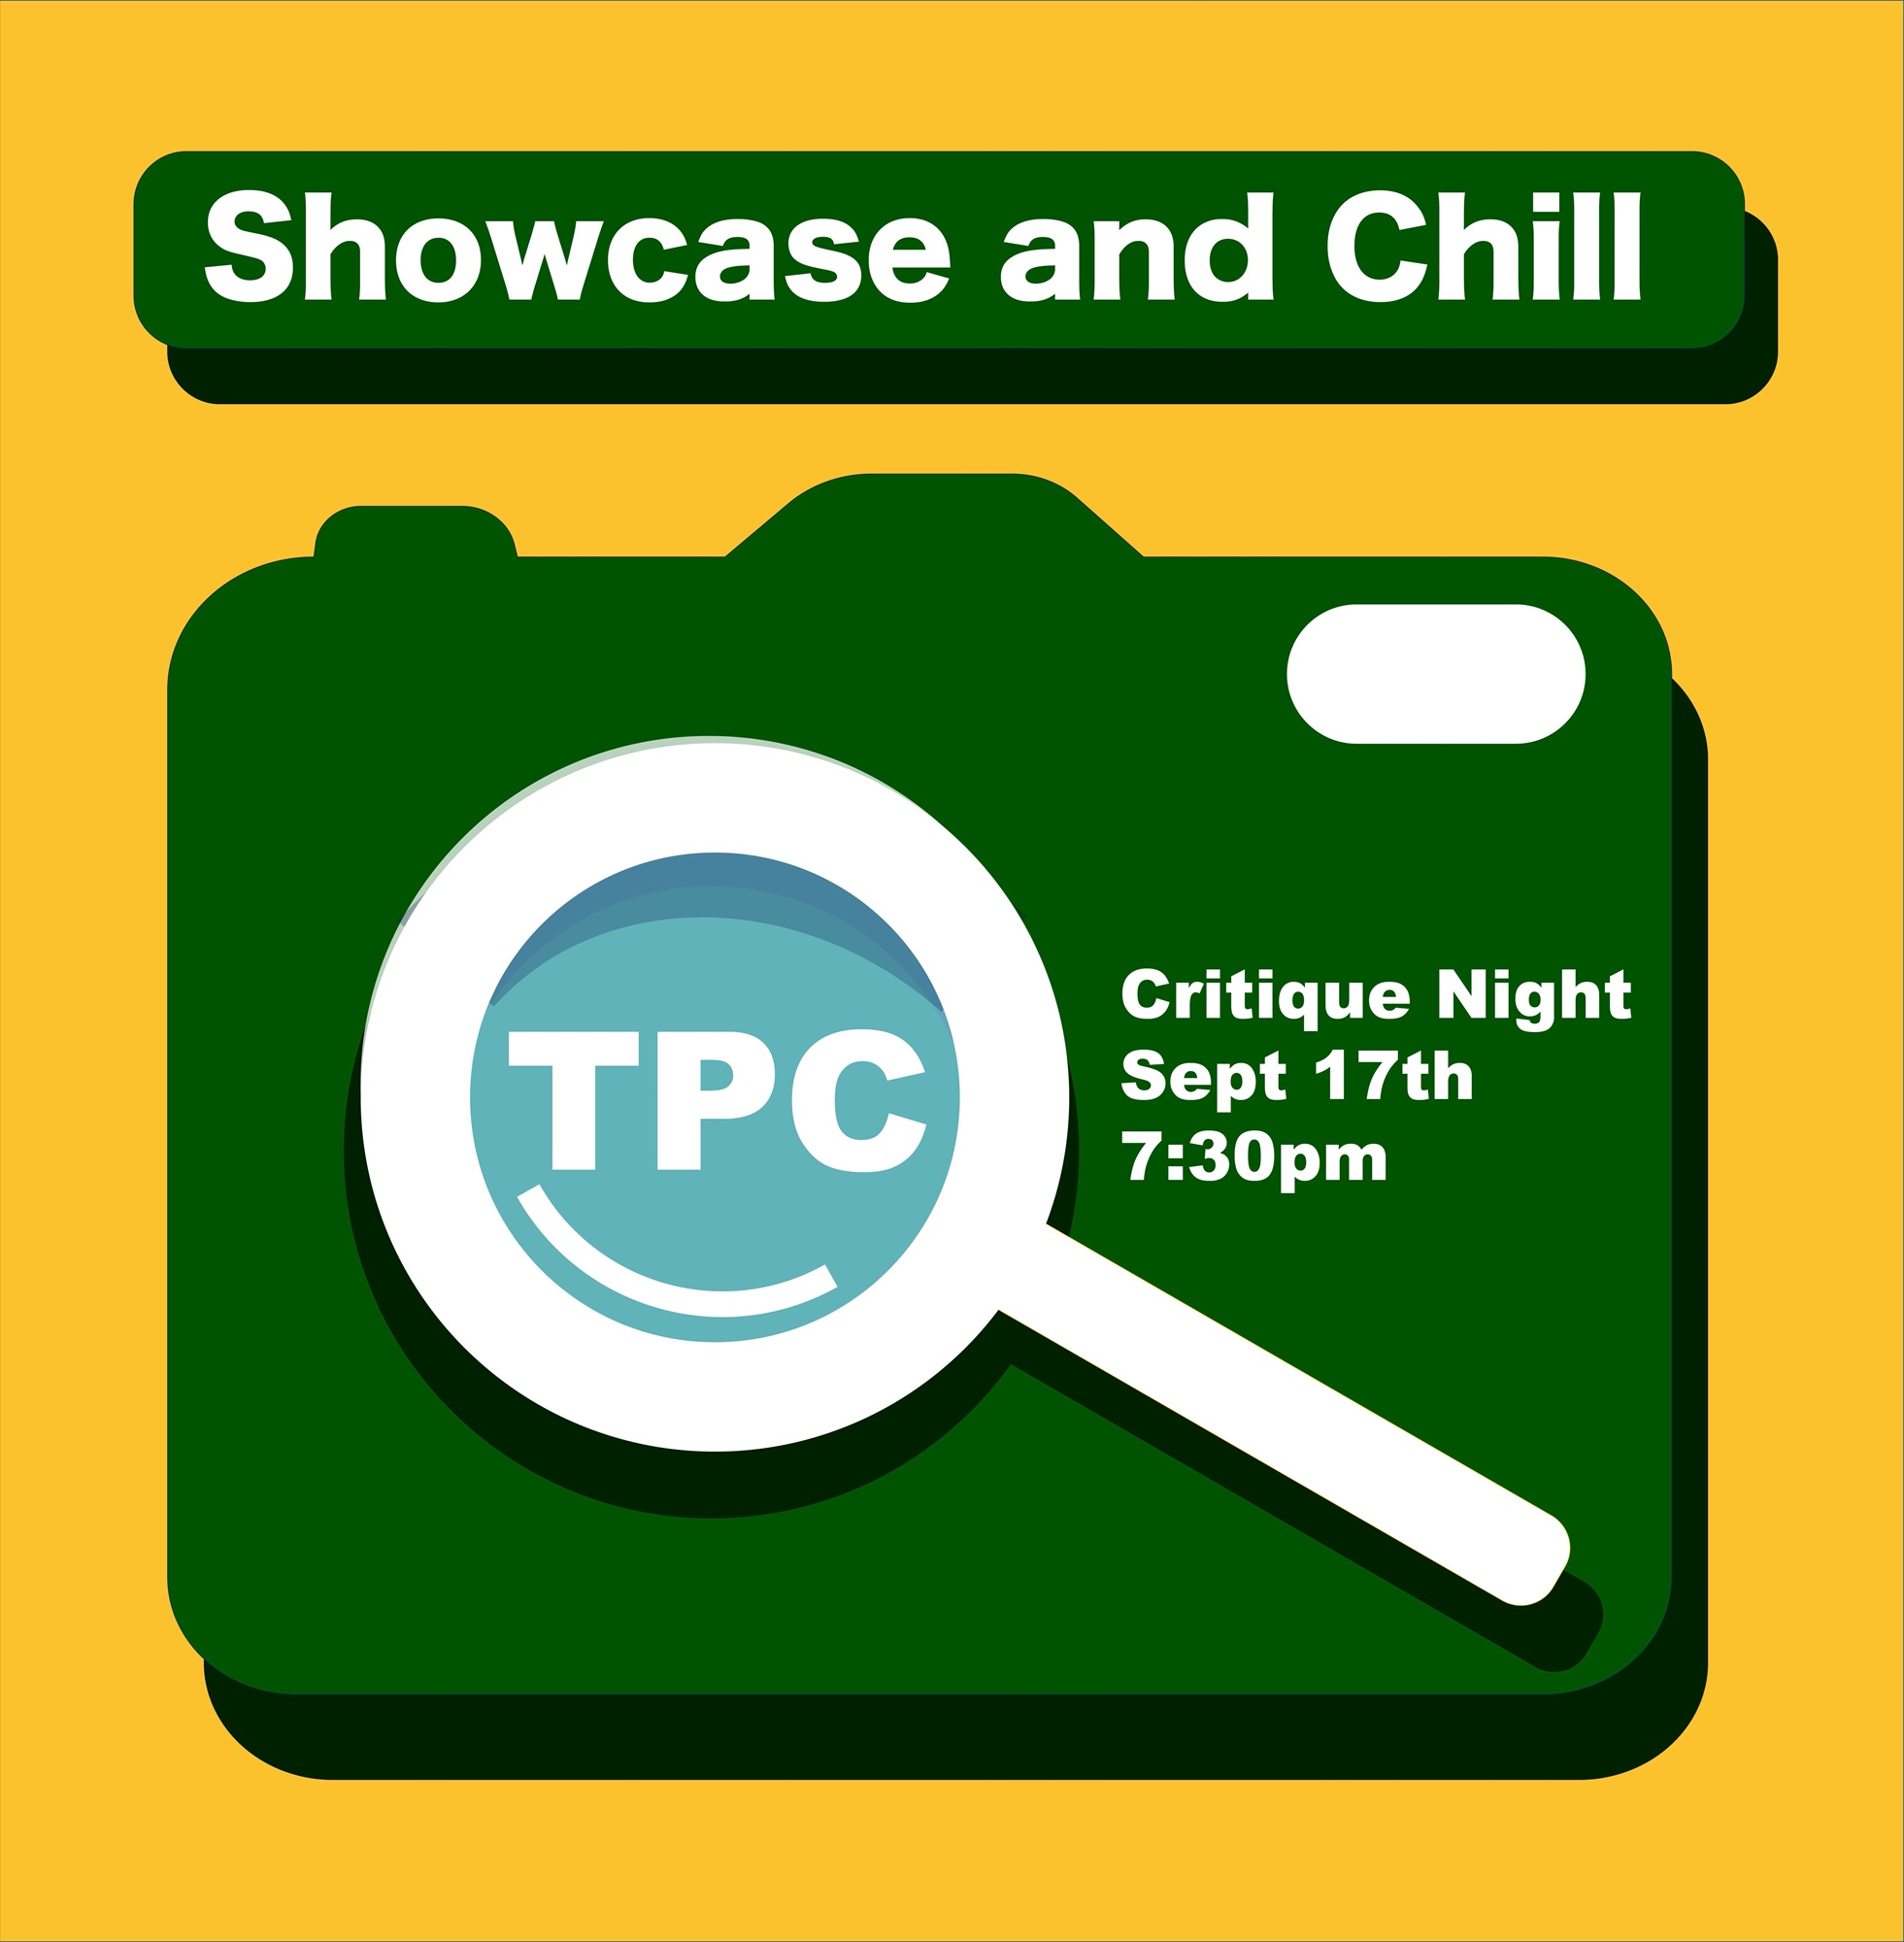 TPC Showcase n' Chill